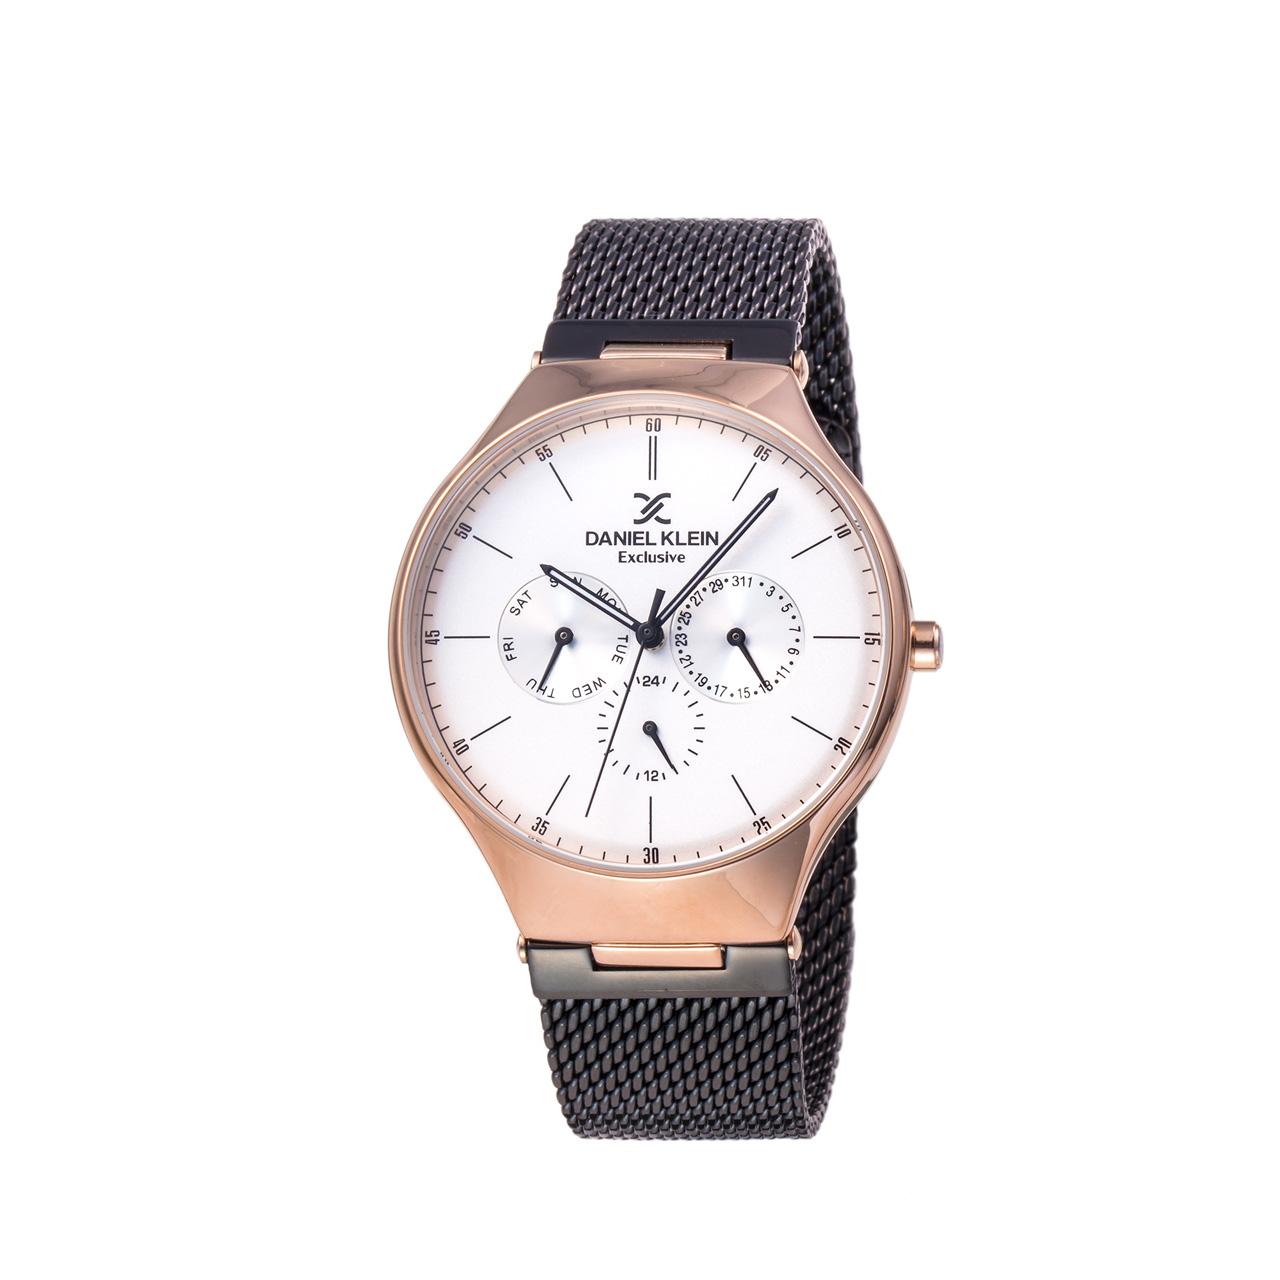 Ceas pentru barbati, Daniel Klein Exclusive, DK11820-5